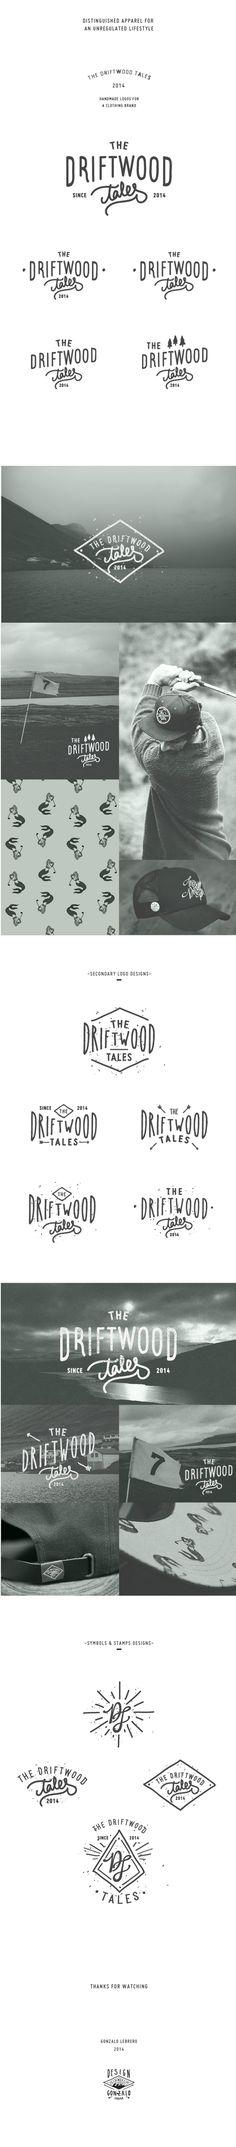 The Driftwood Tales by Gonzalo Lebrero, via Behance